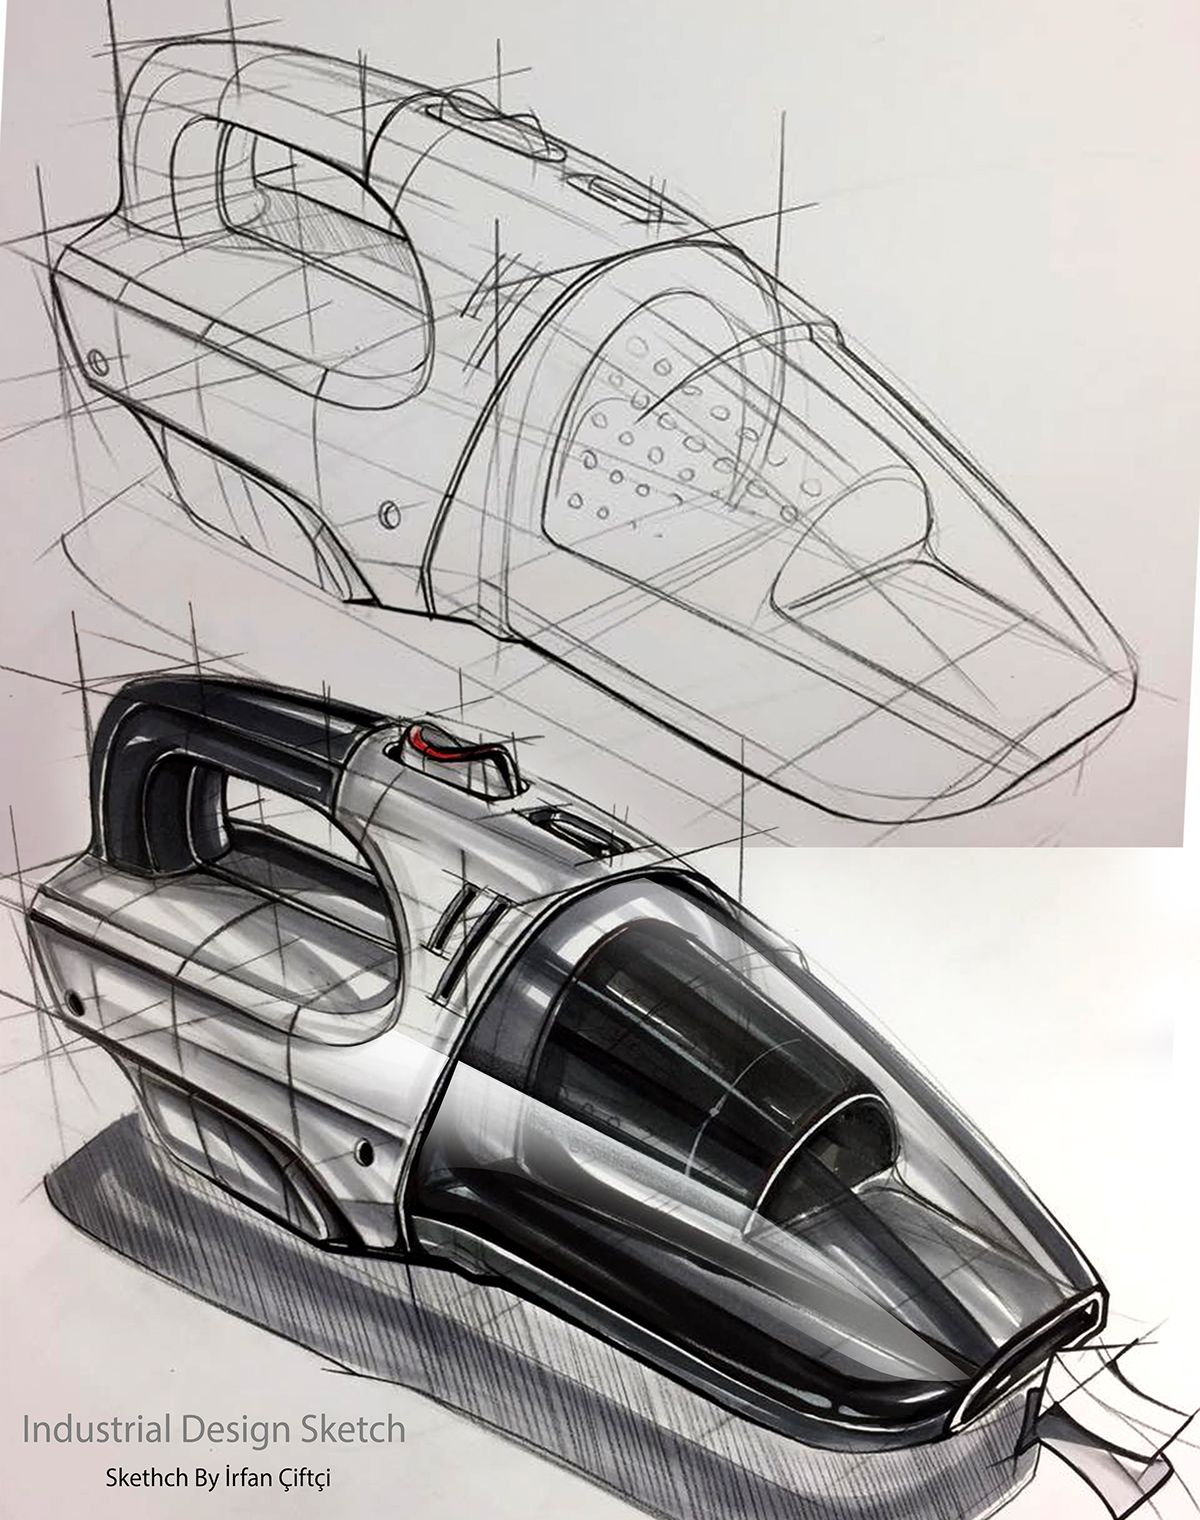 Industrial Design: Industrail Design Sketch & Marker Rendering Tutorial On